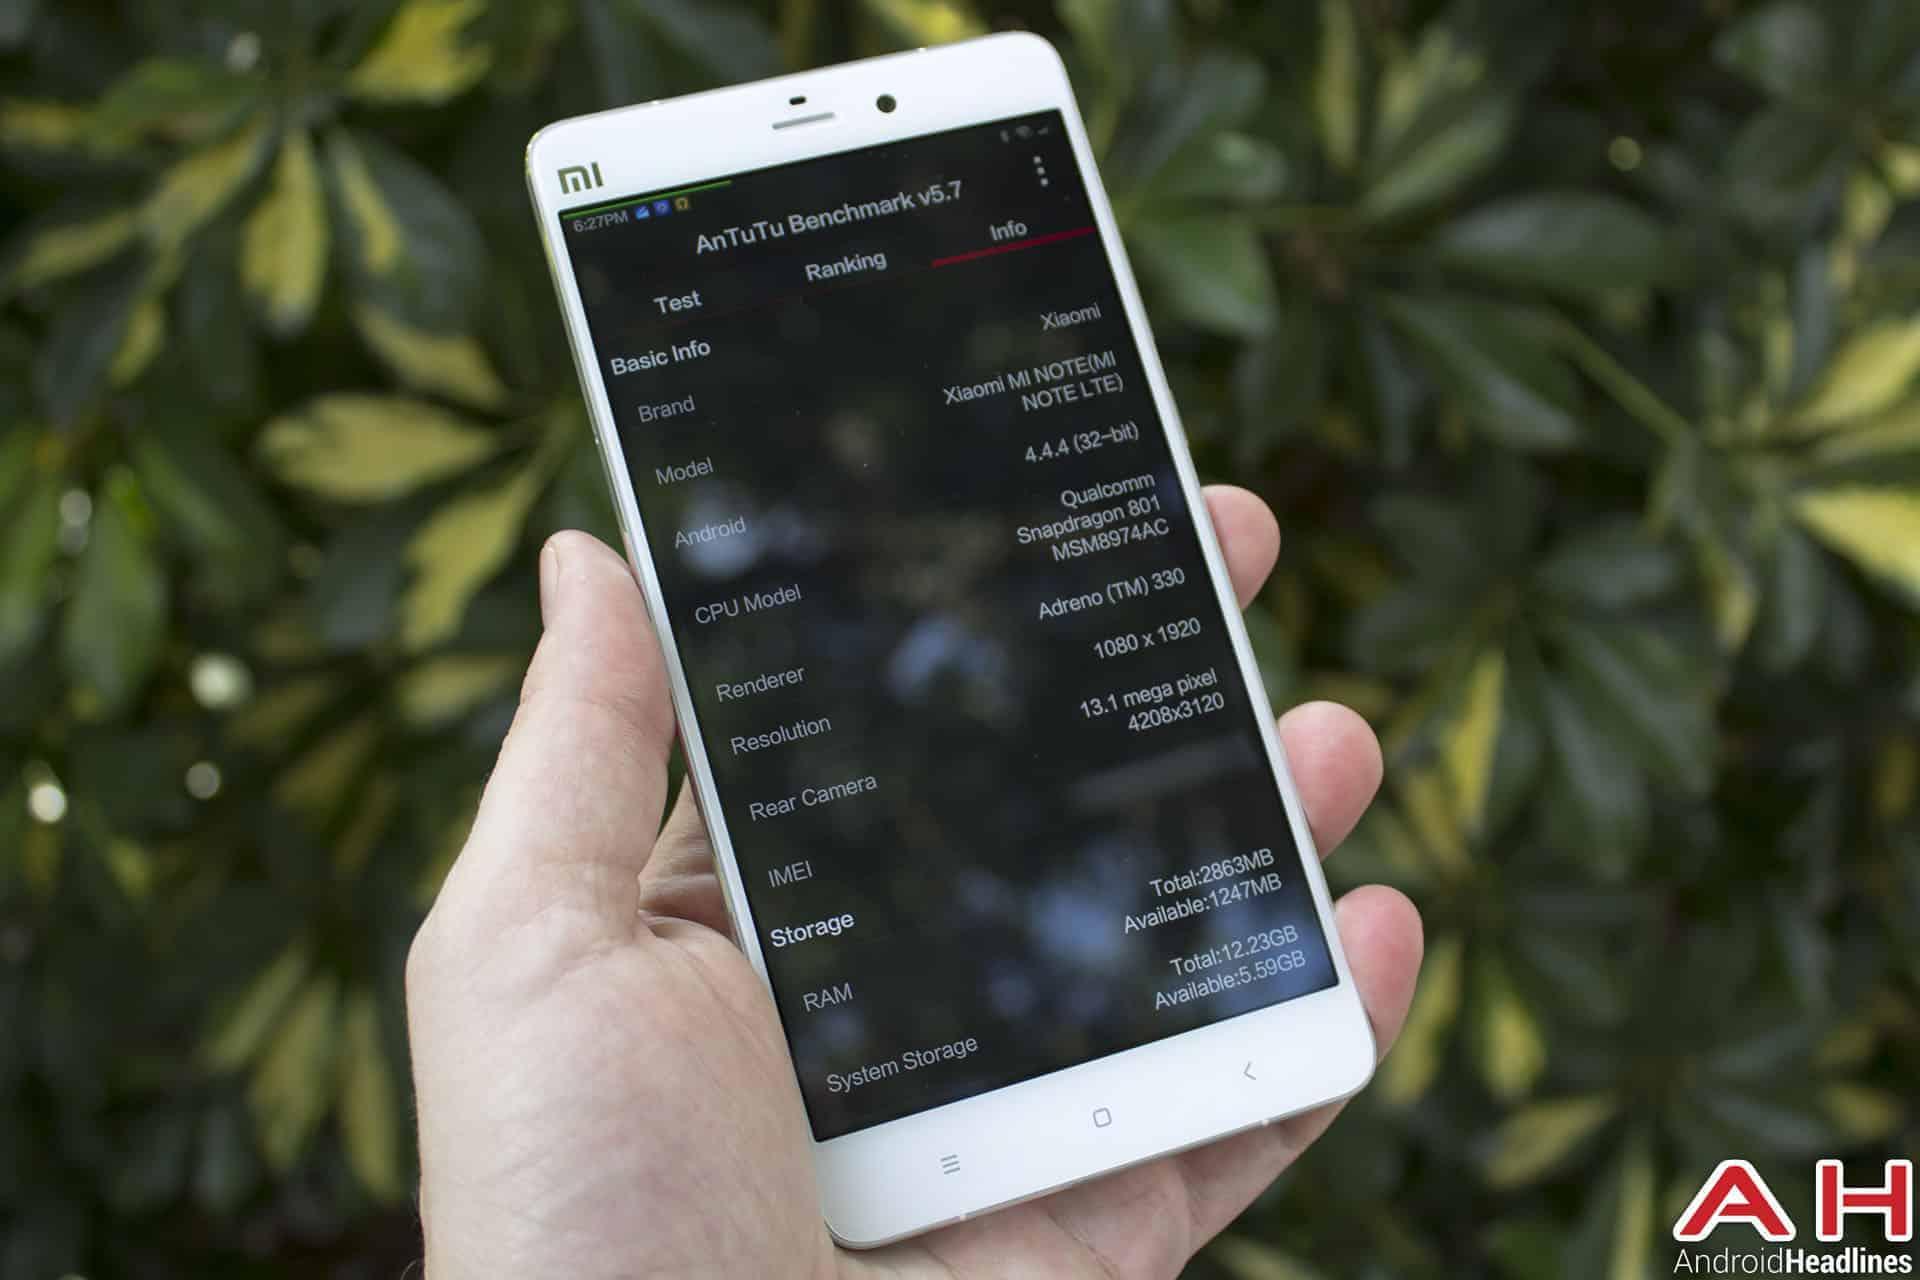 Xiaomi-Mi-Note-Bamboo-specs1